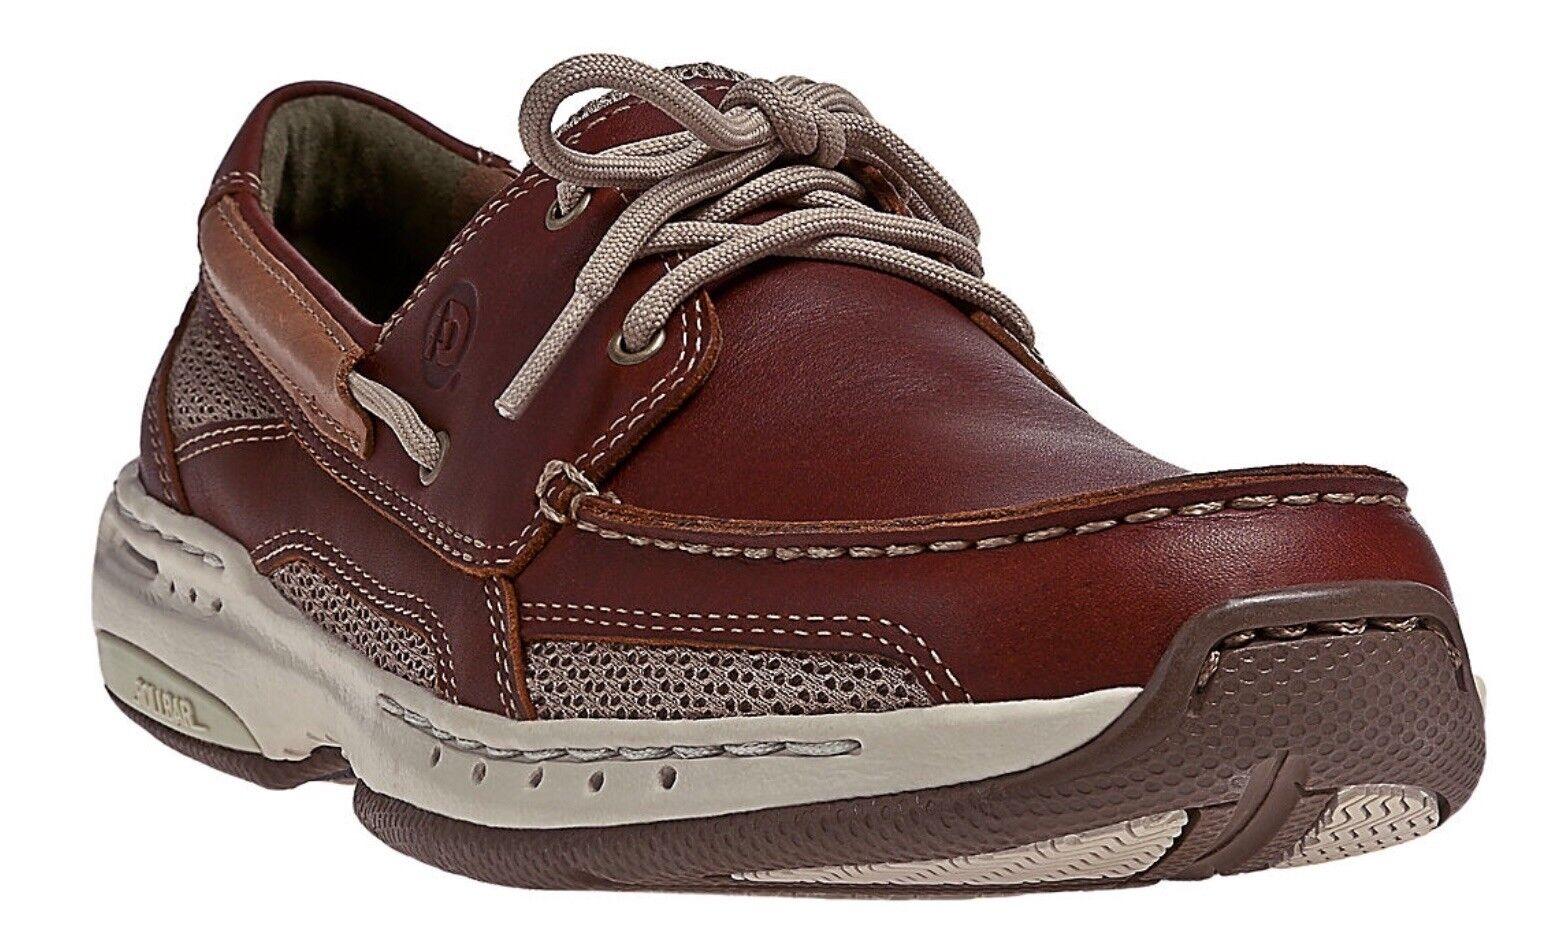 NIB Mens Dunham Captain Non-Slip Lace Up Mesh Comfortable Boat shoes I